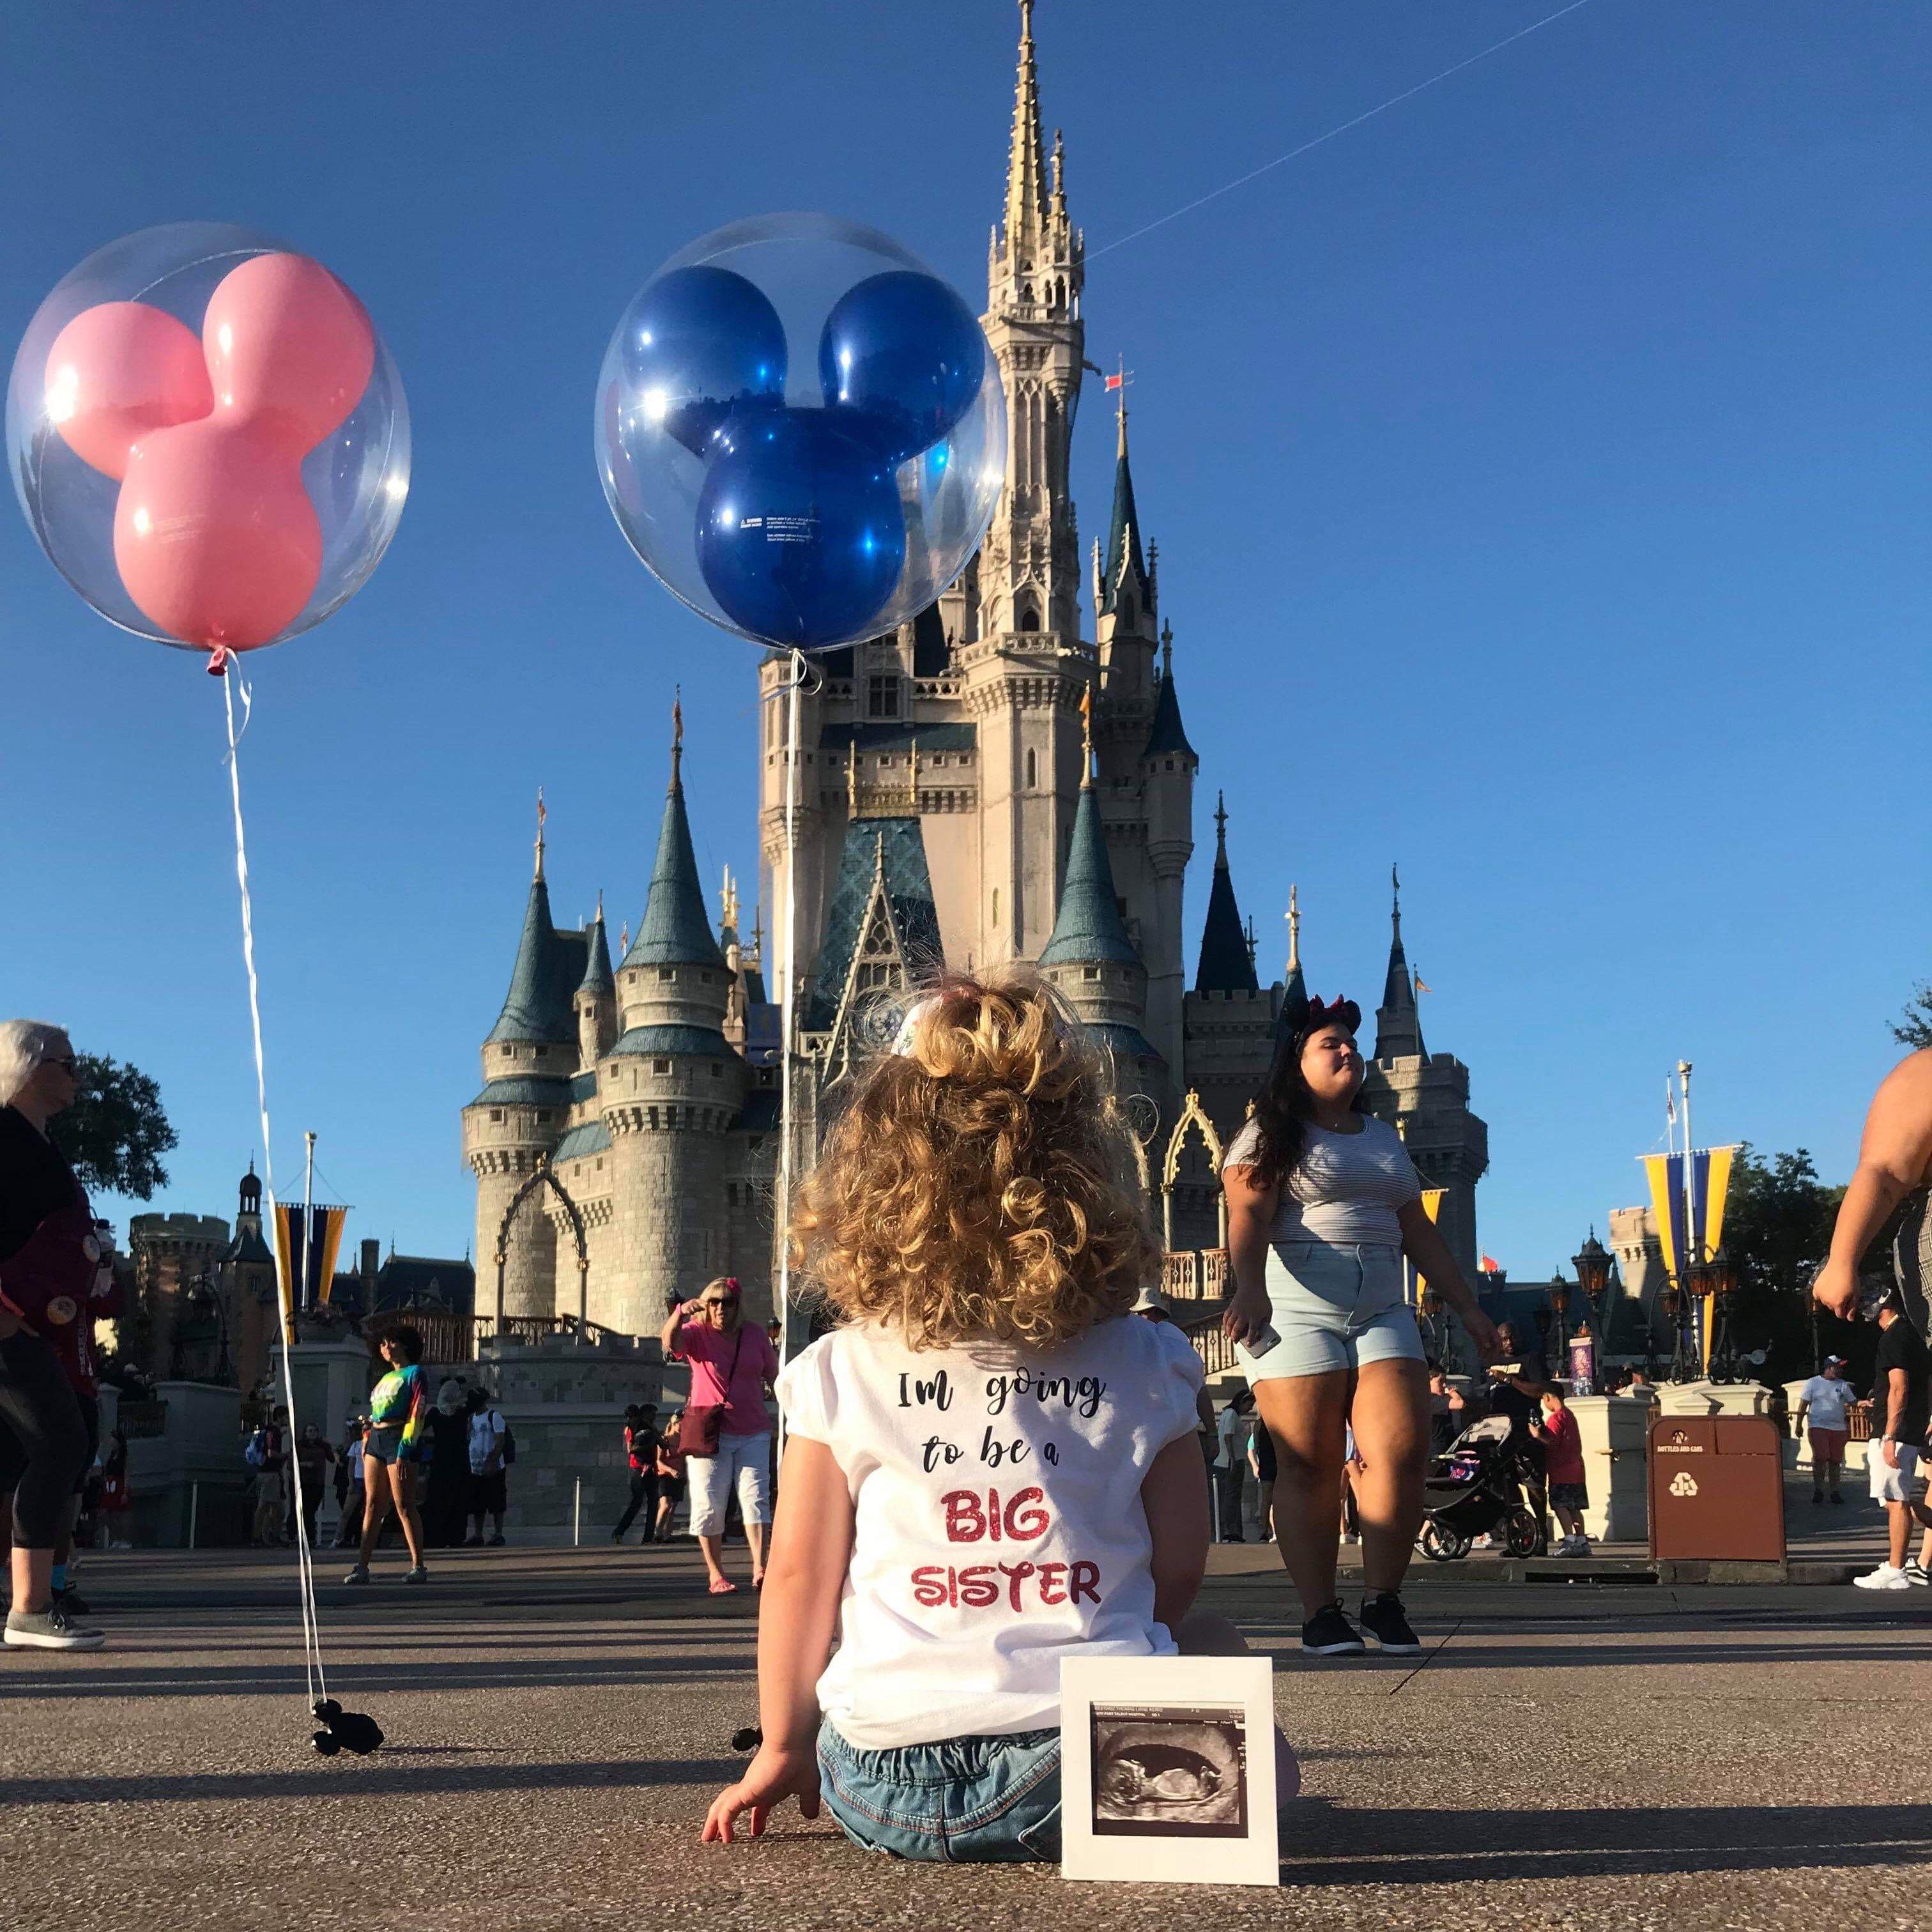 Disney Pregnancy Announcement Gender Reveal Pregnancy Announcement New Baby Onesie baby Girl Announcement Baby Onesie Baby Shower Gift